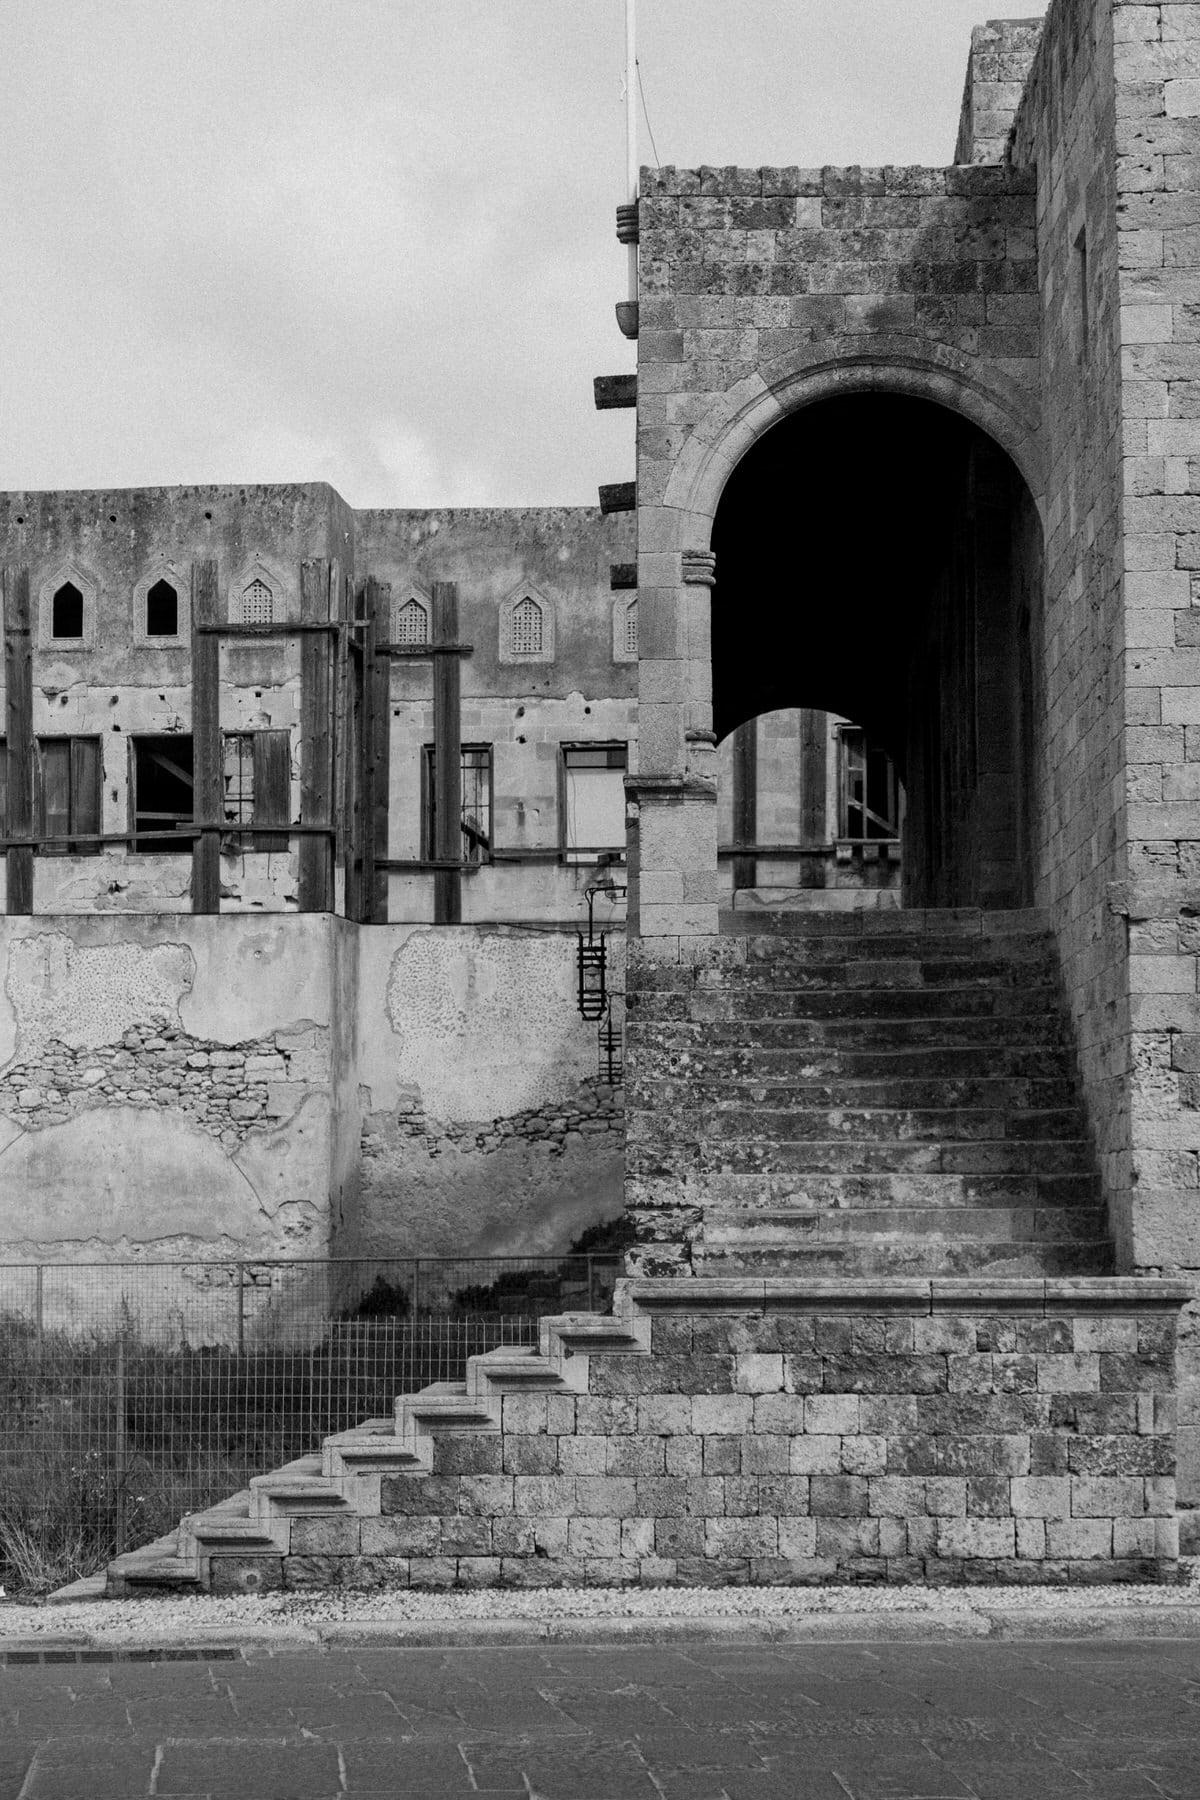 Rhodes-Greece-Island-black-and-white-fine-art-photography-by-Studio-L-photographer-Laura-Schneider-_2752